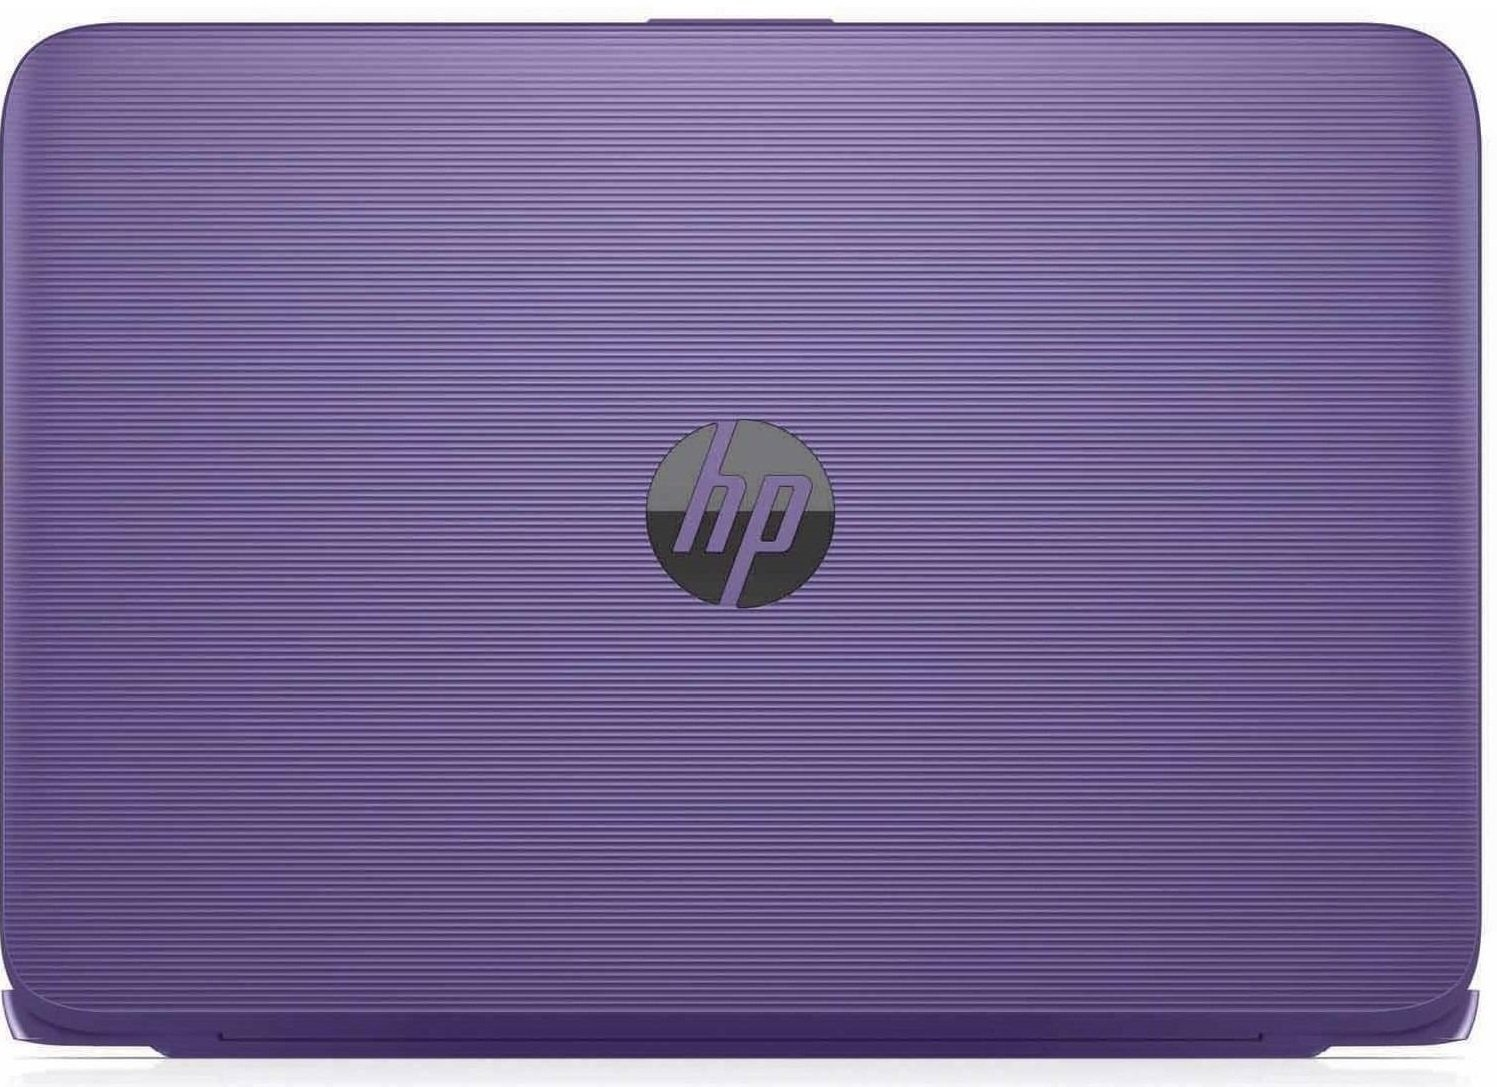 2017 HP Stream 11 11.6 inch Premium Flagship Laptop Computer, Intel Celeron N3060 1.6GHz, 4GB RAM, 32GB eMMC drive, 802.11ac WiFi, USB 3.1 port, Windows 10 Home, Purple (Certified Refurbished)